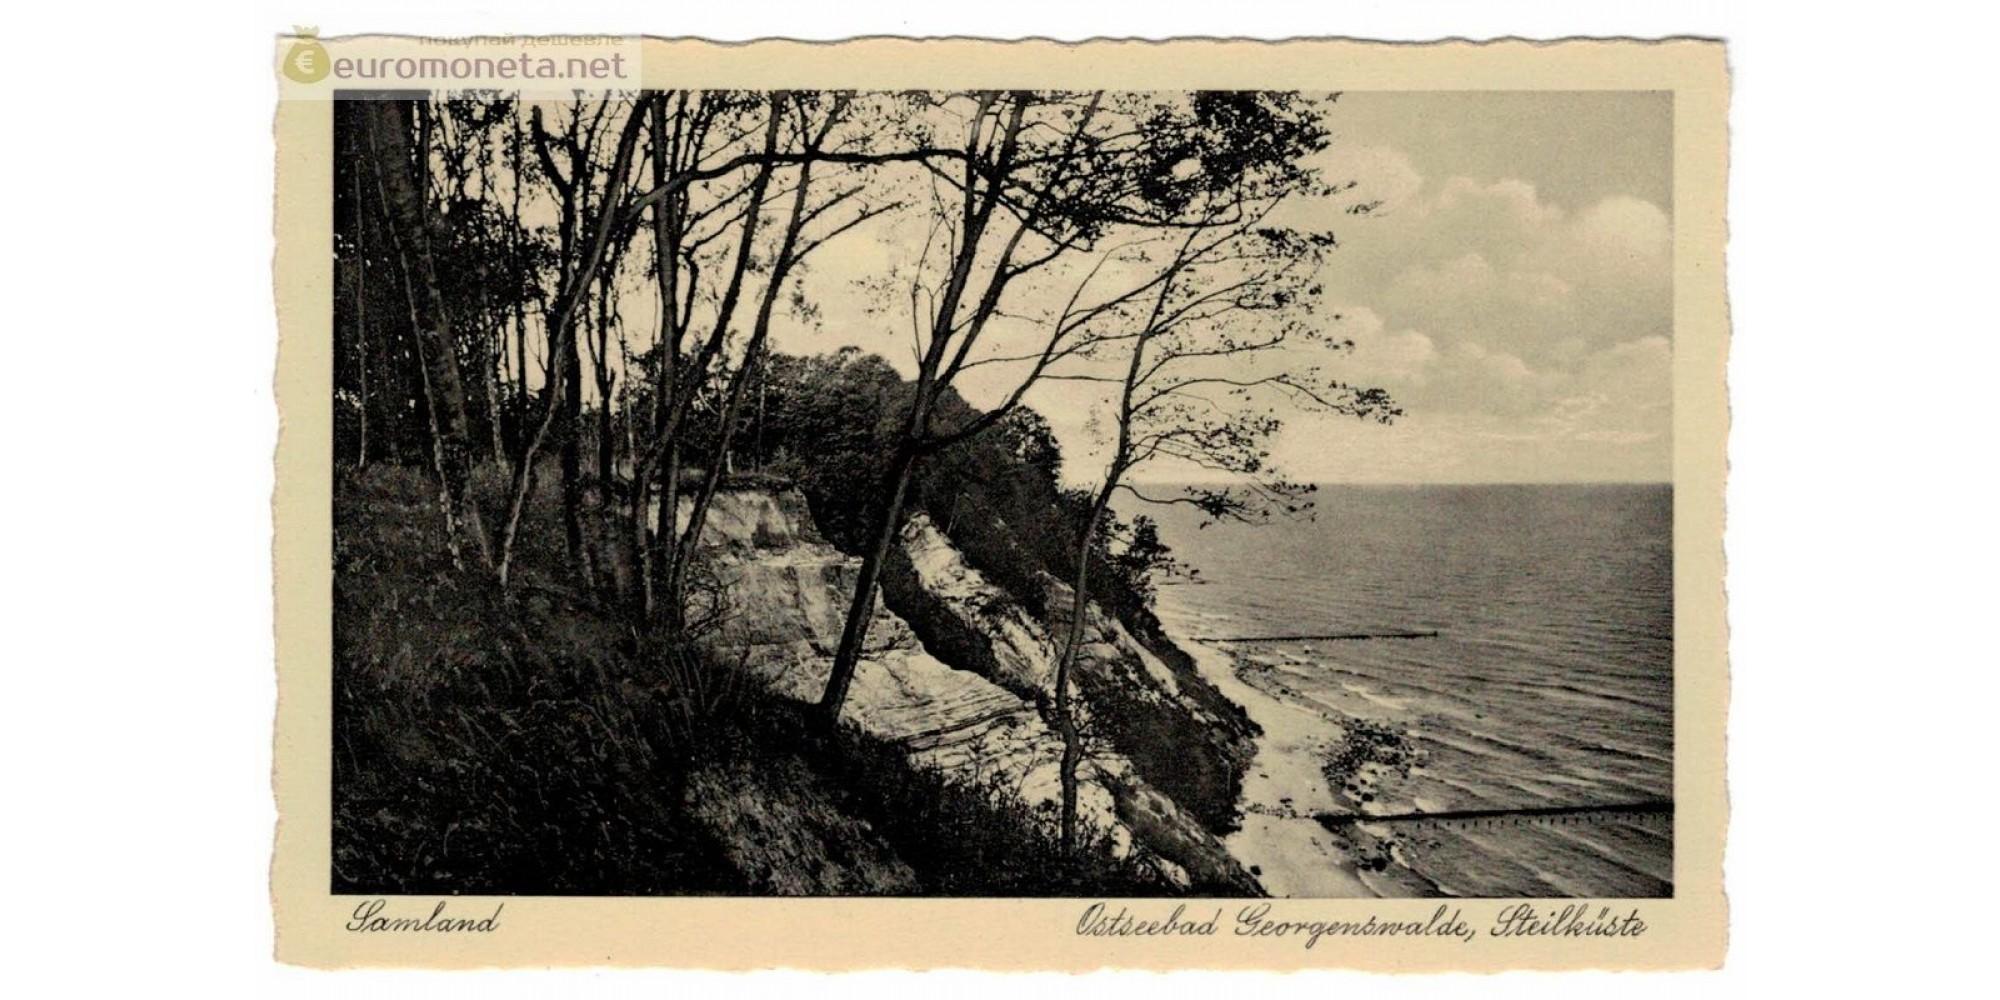 Открытка Пруссия Georgenswalde, Георгенсвальде Отрадное Балтийское море Lamland